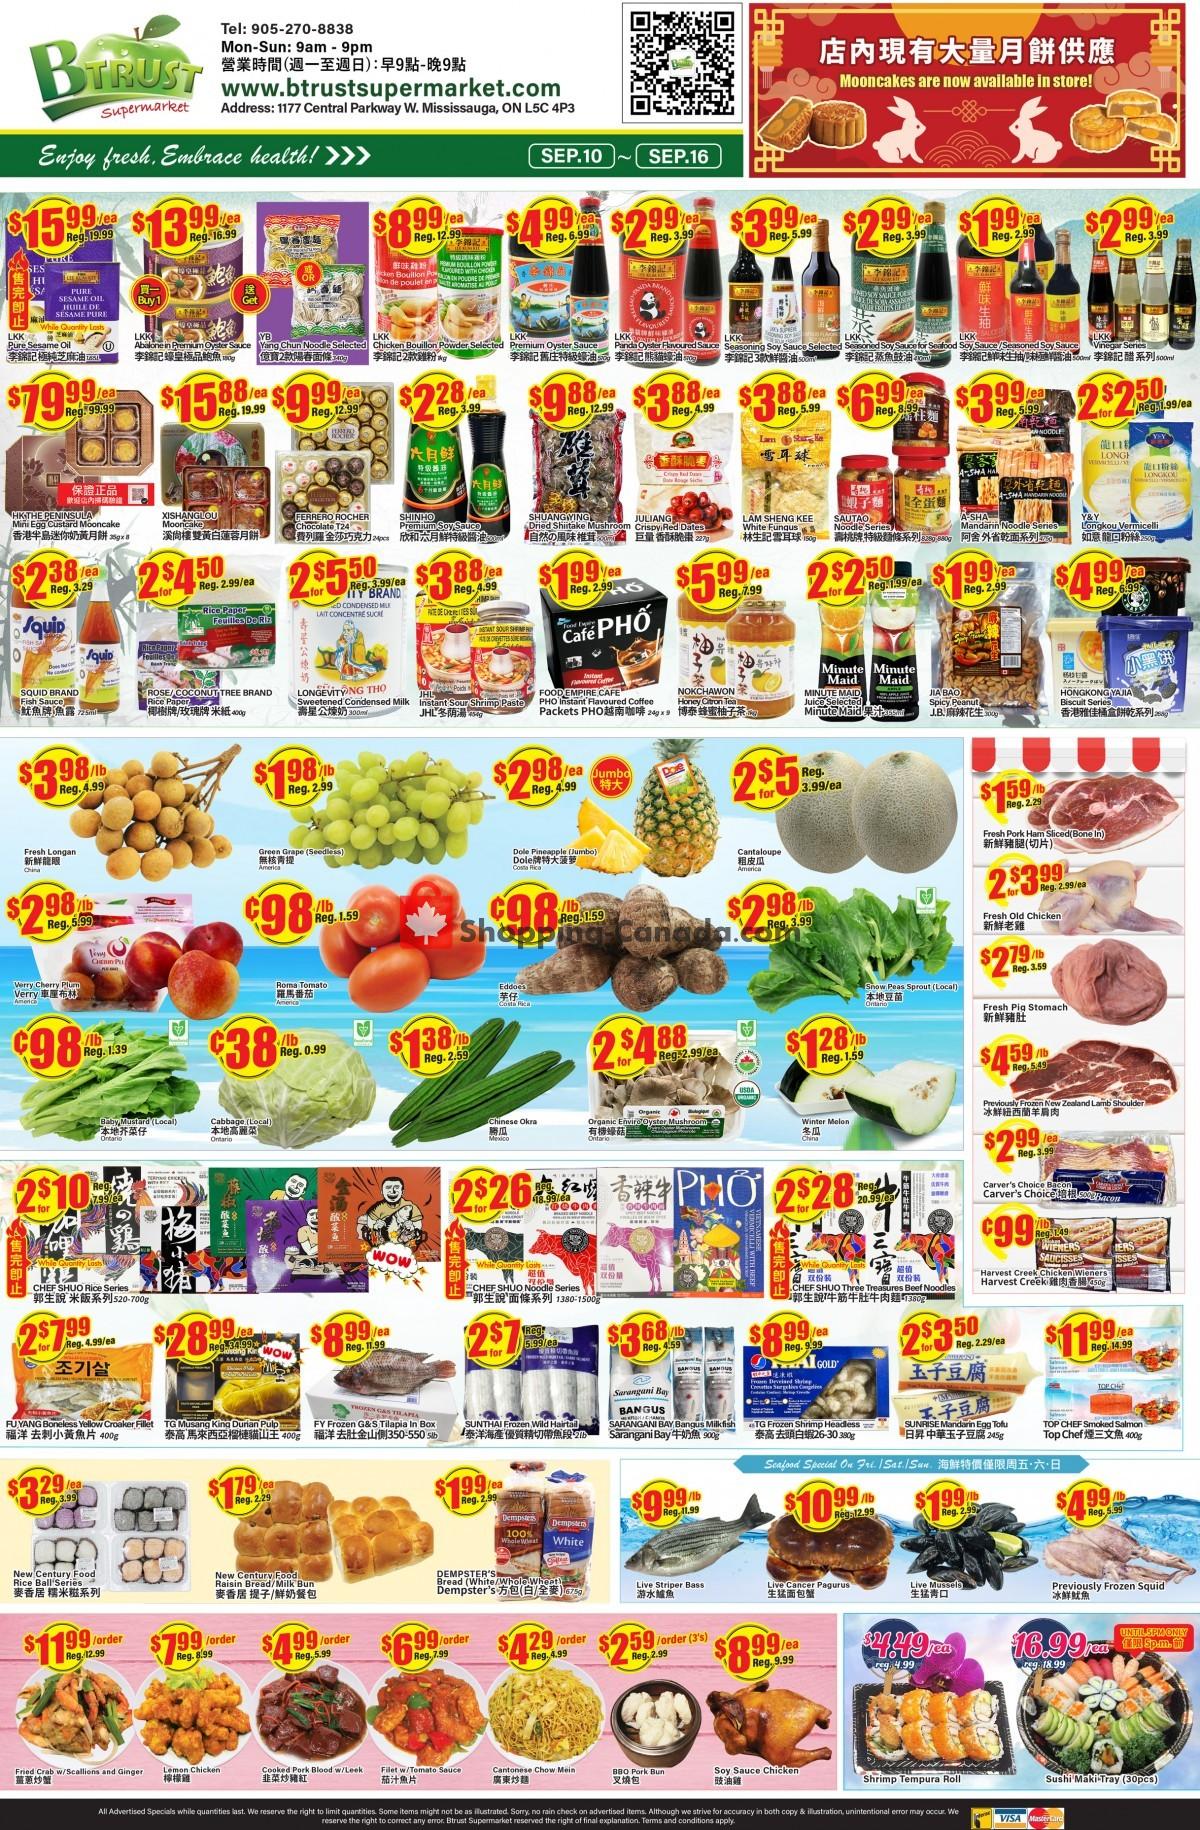 Flyer Btrust Supermarket Canada - from Friday September 10, 2021 to Thursday September 16, 2021